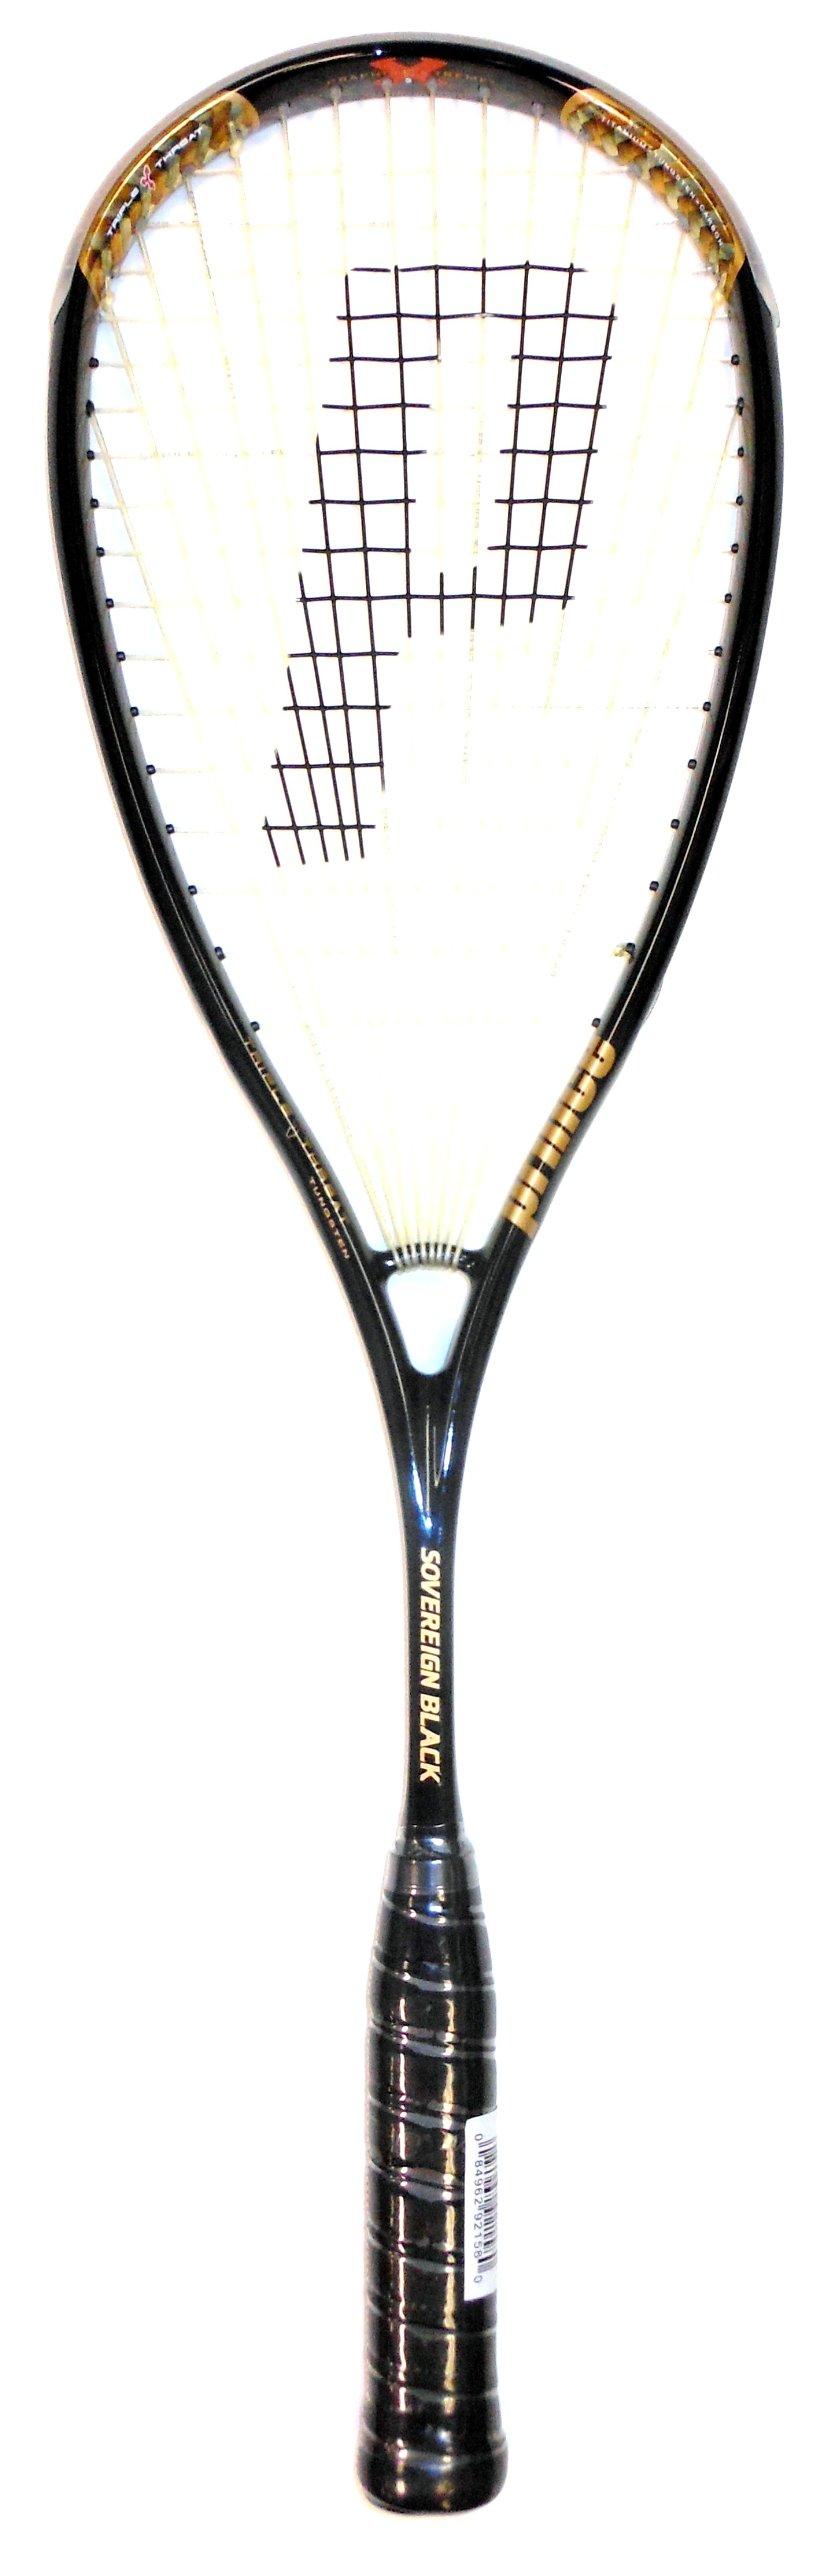 Prince TT Sovereign Black Squash Racquet